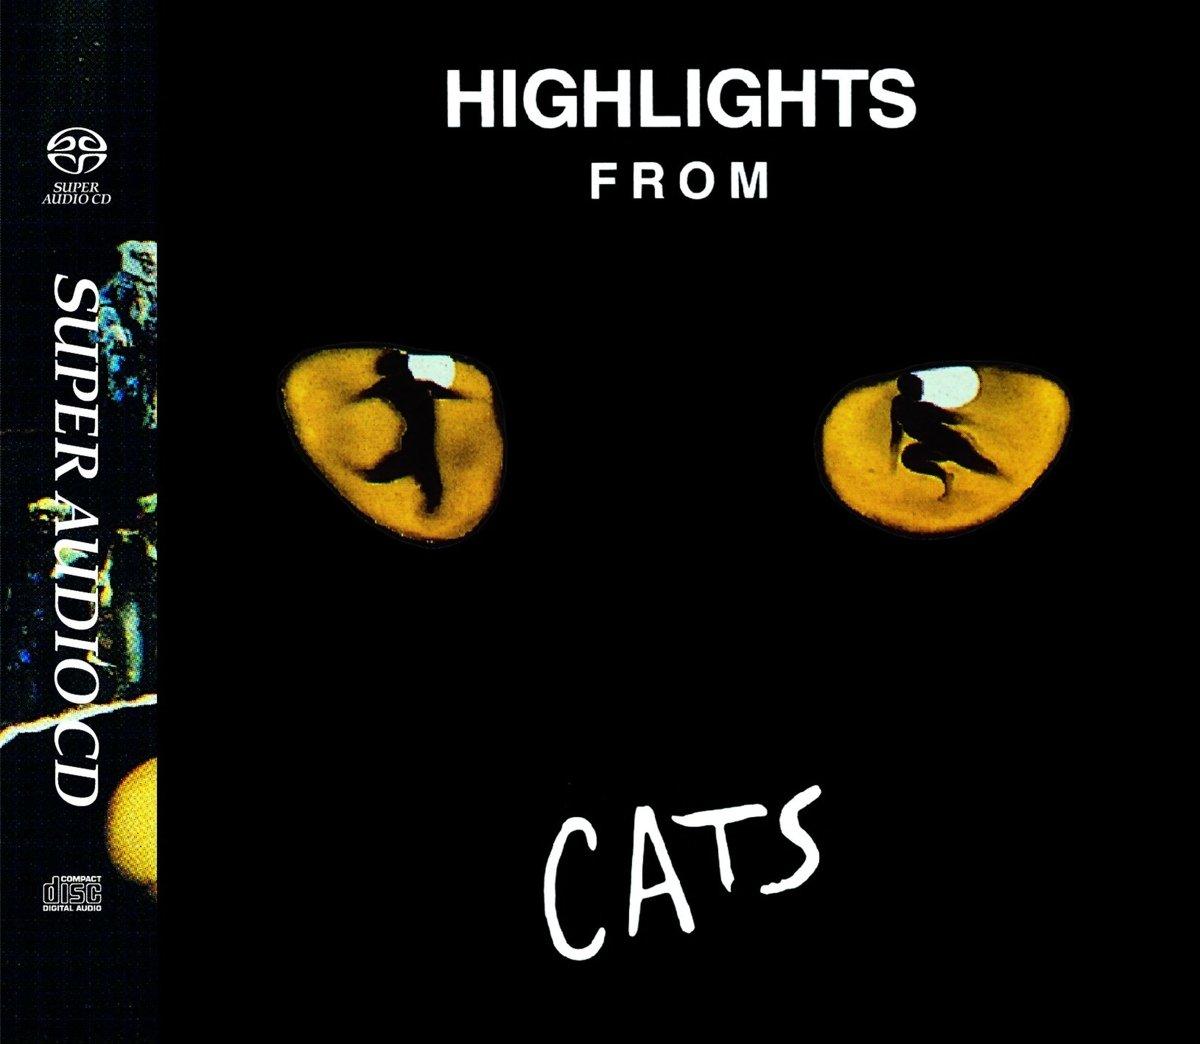 SACD : Andrew Lloyd Webber - Highlights From Cats (1981 Original London Cast) (original Soundtrack) (Hong Kong - Import)